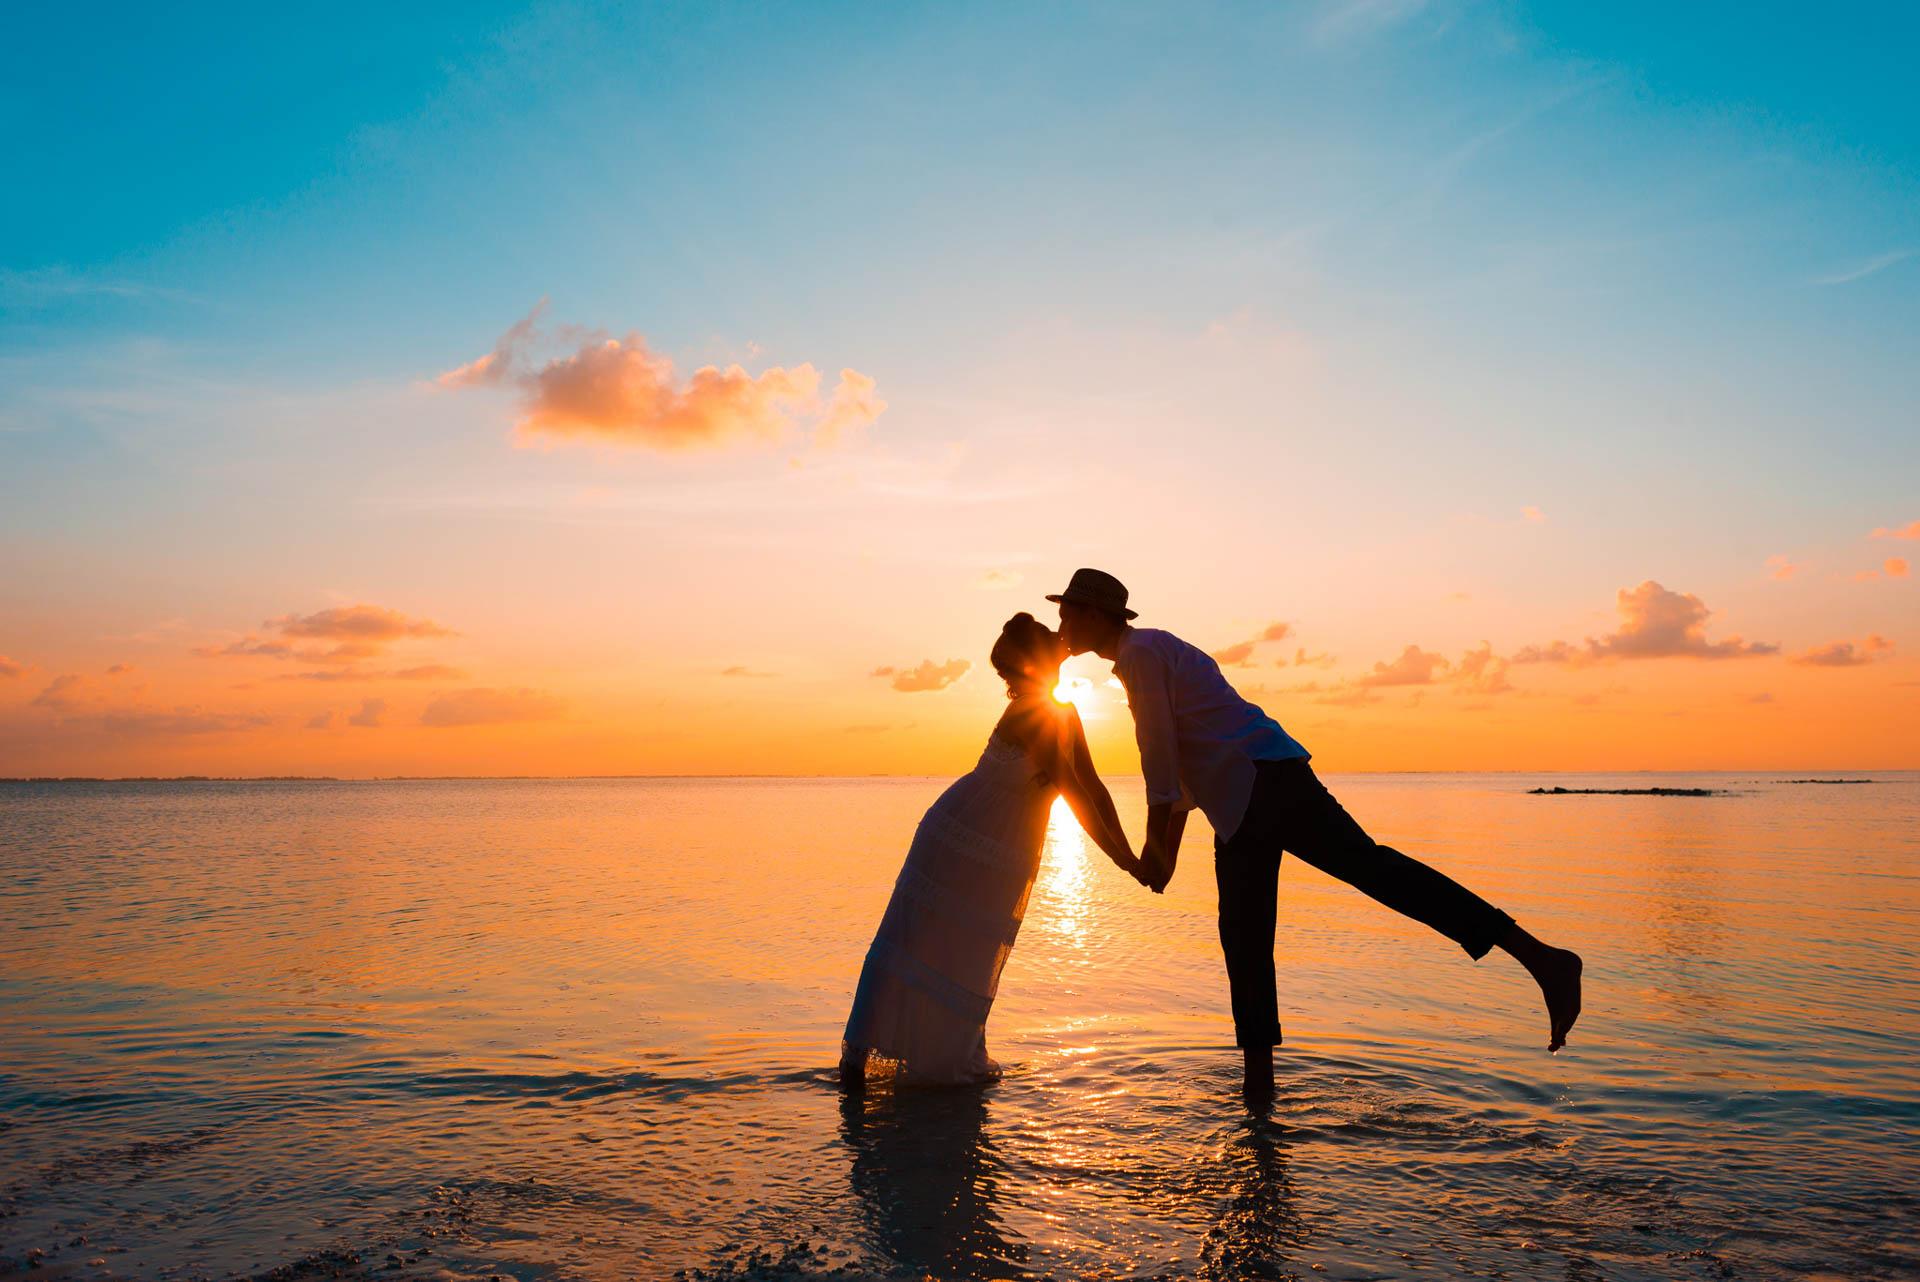 Heike Michaels Beach Wedding in Maldives 2